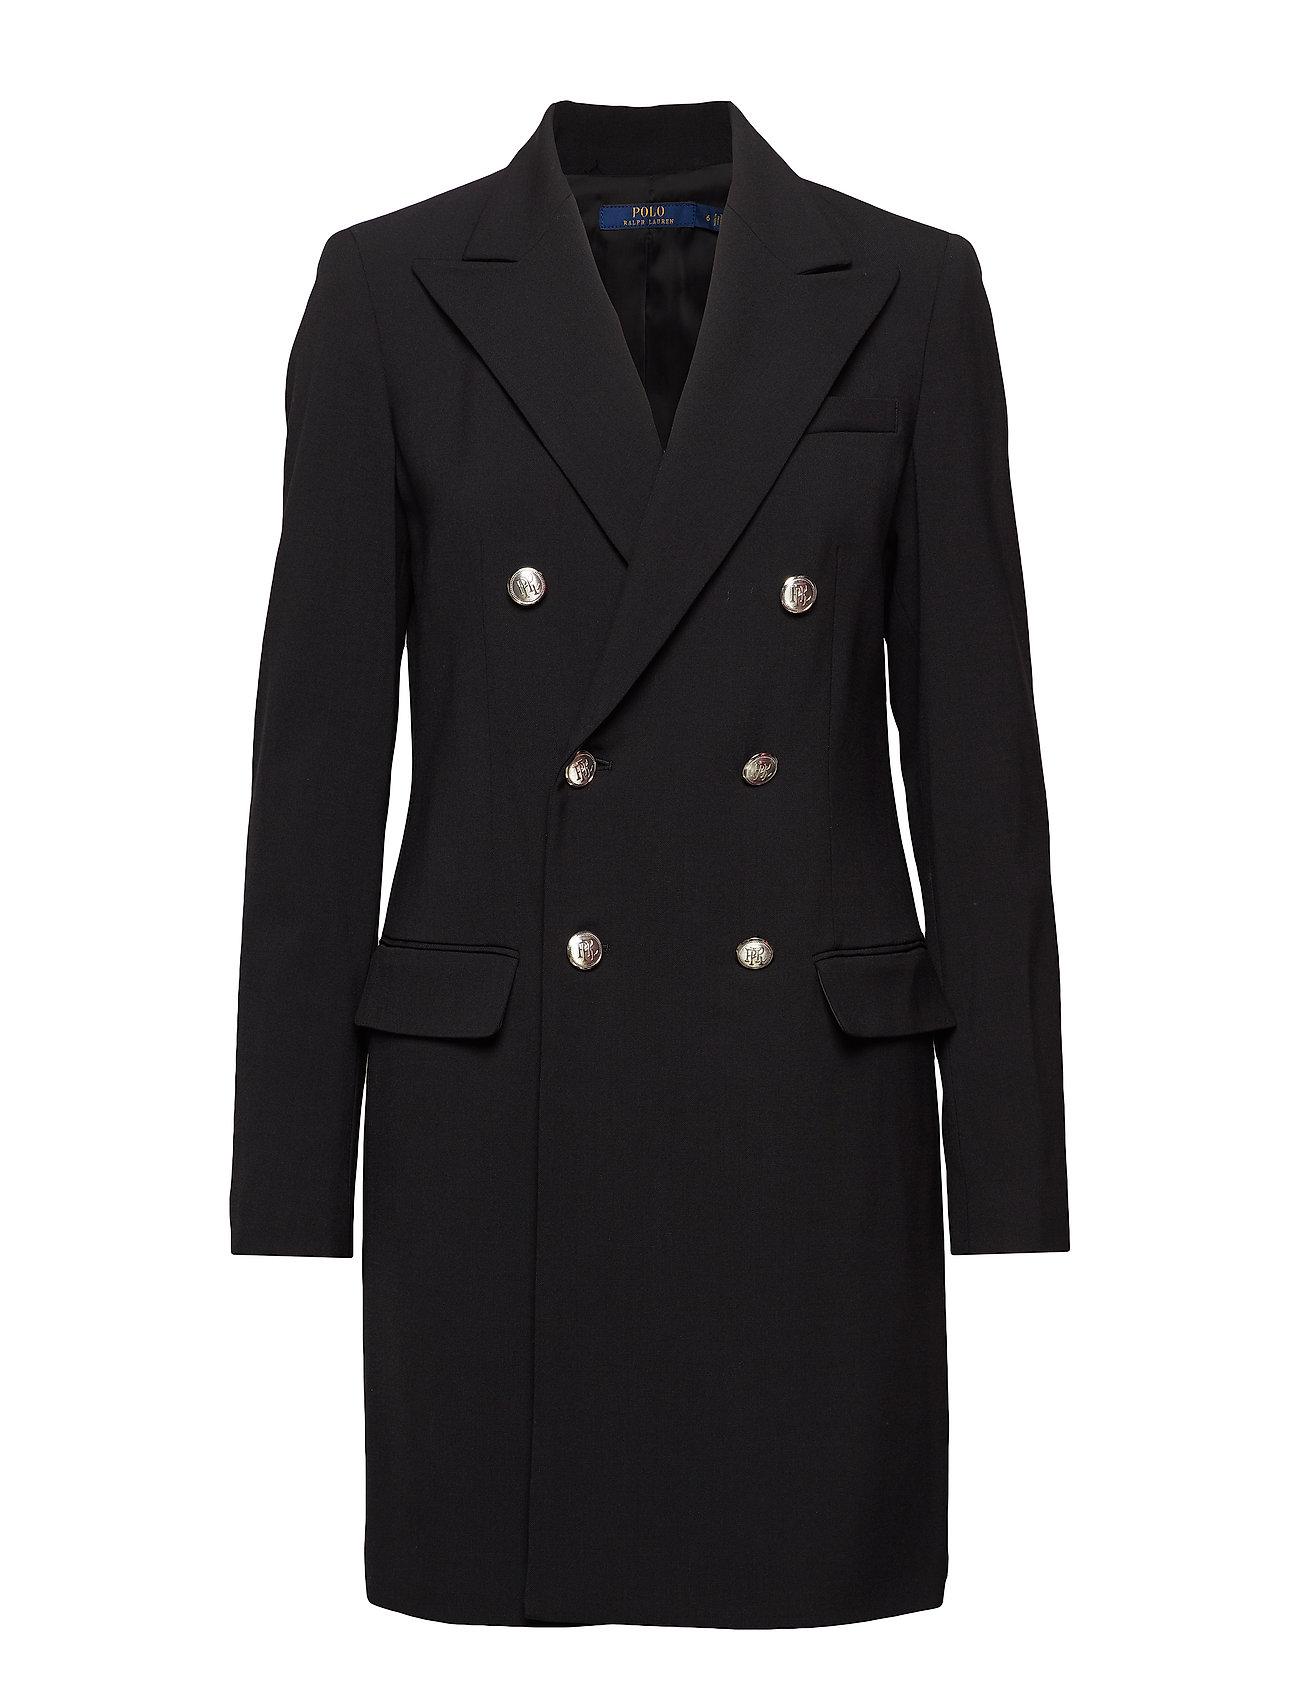 Polo Ralph Lauren Double-Breasted Wool Blazer